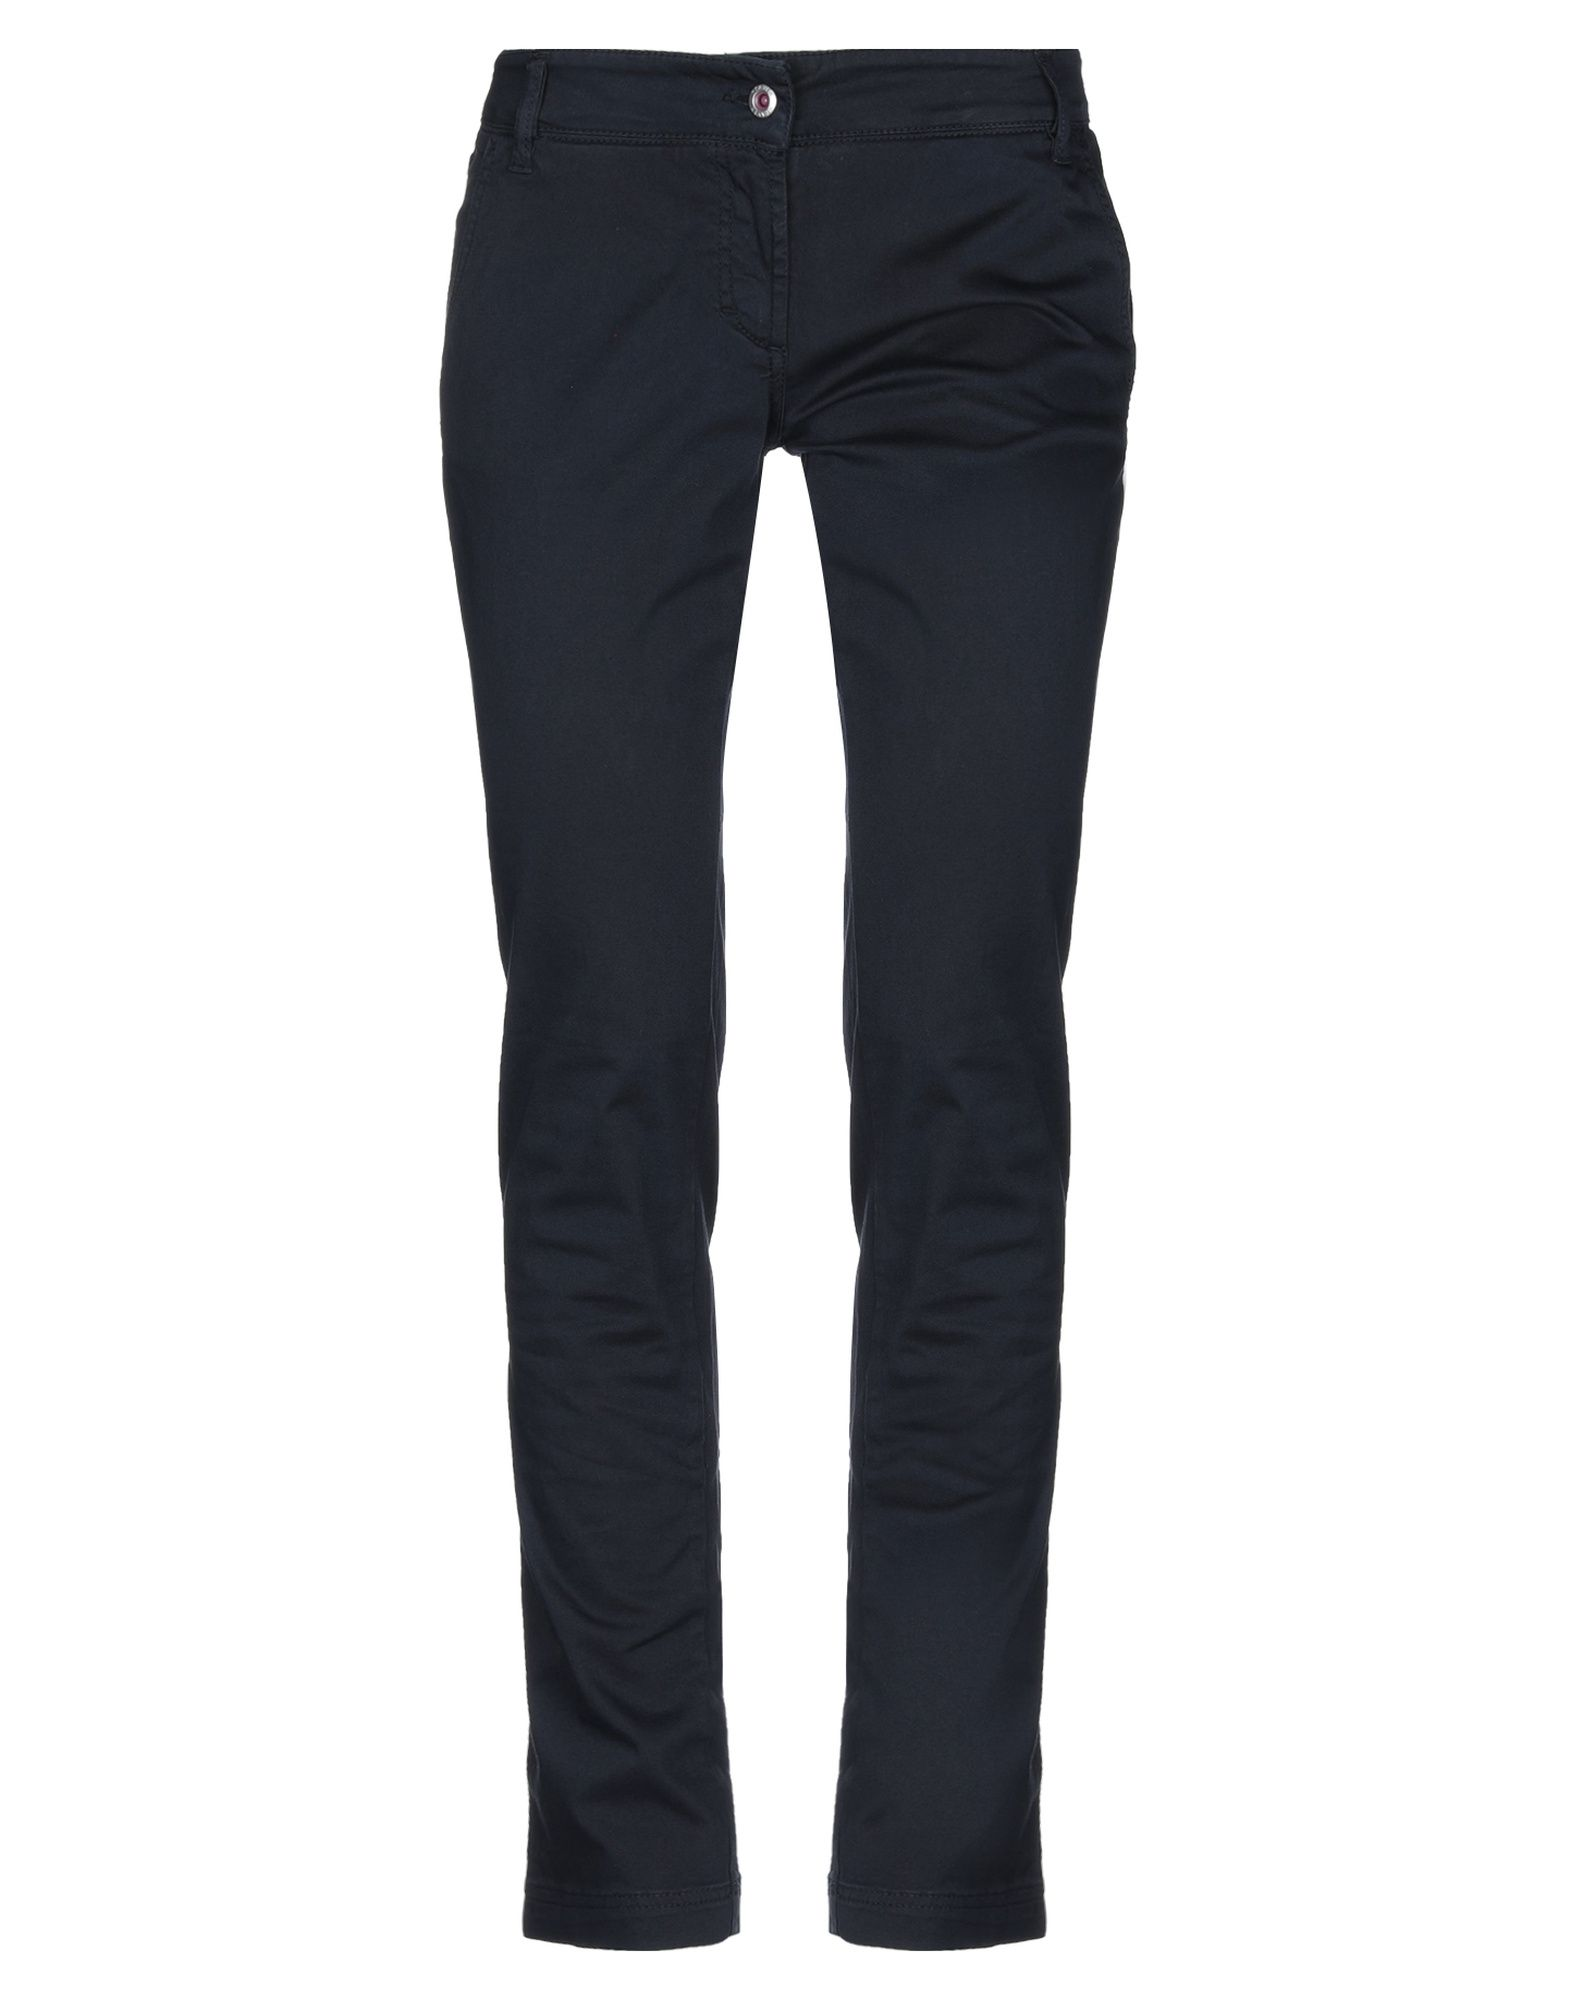 TWINGS for HEAVEN TWO Повседневные брюки цена 2017